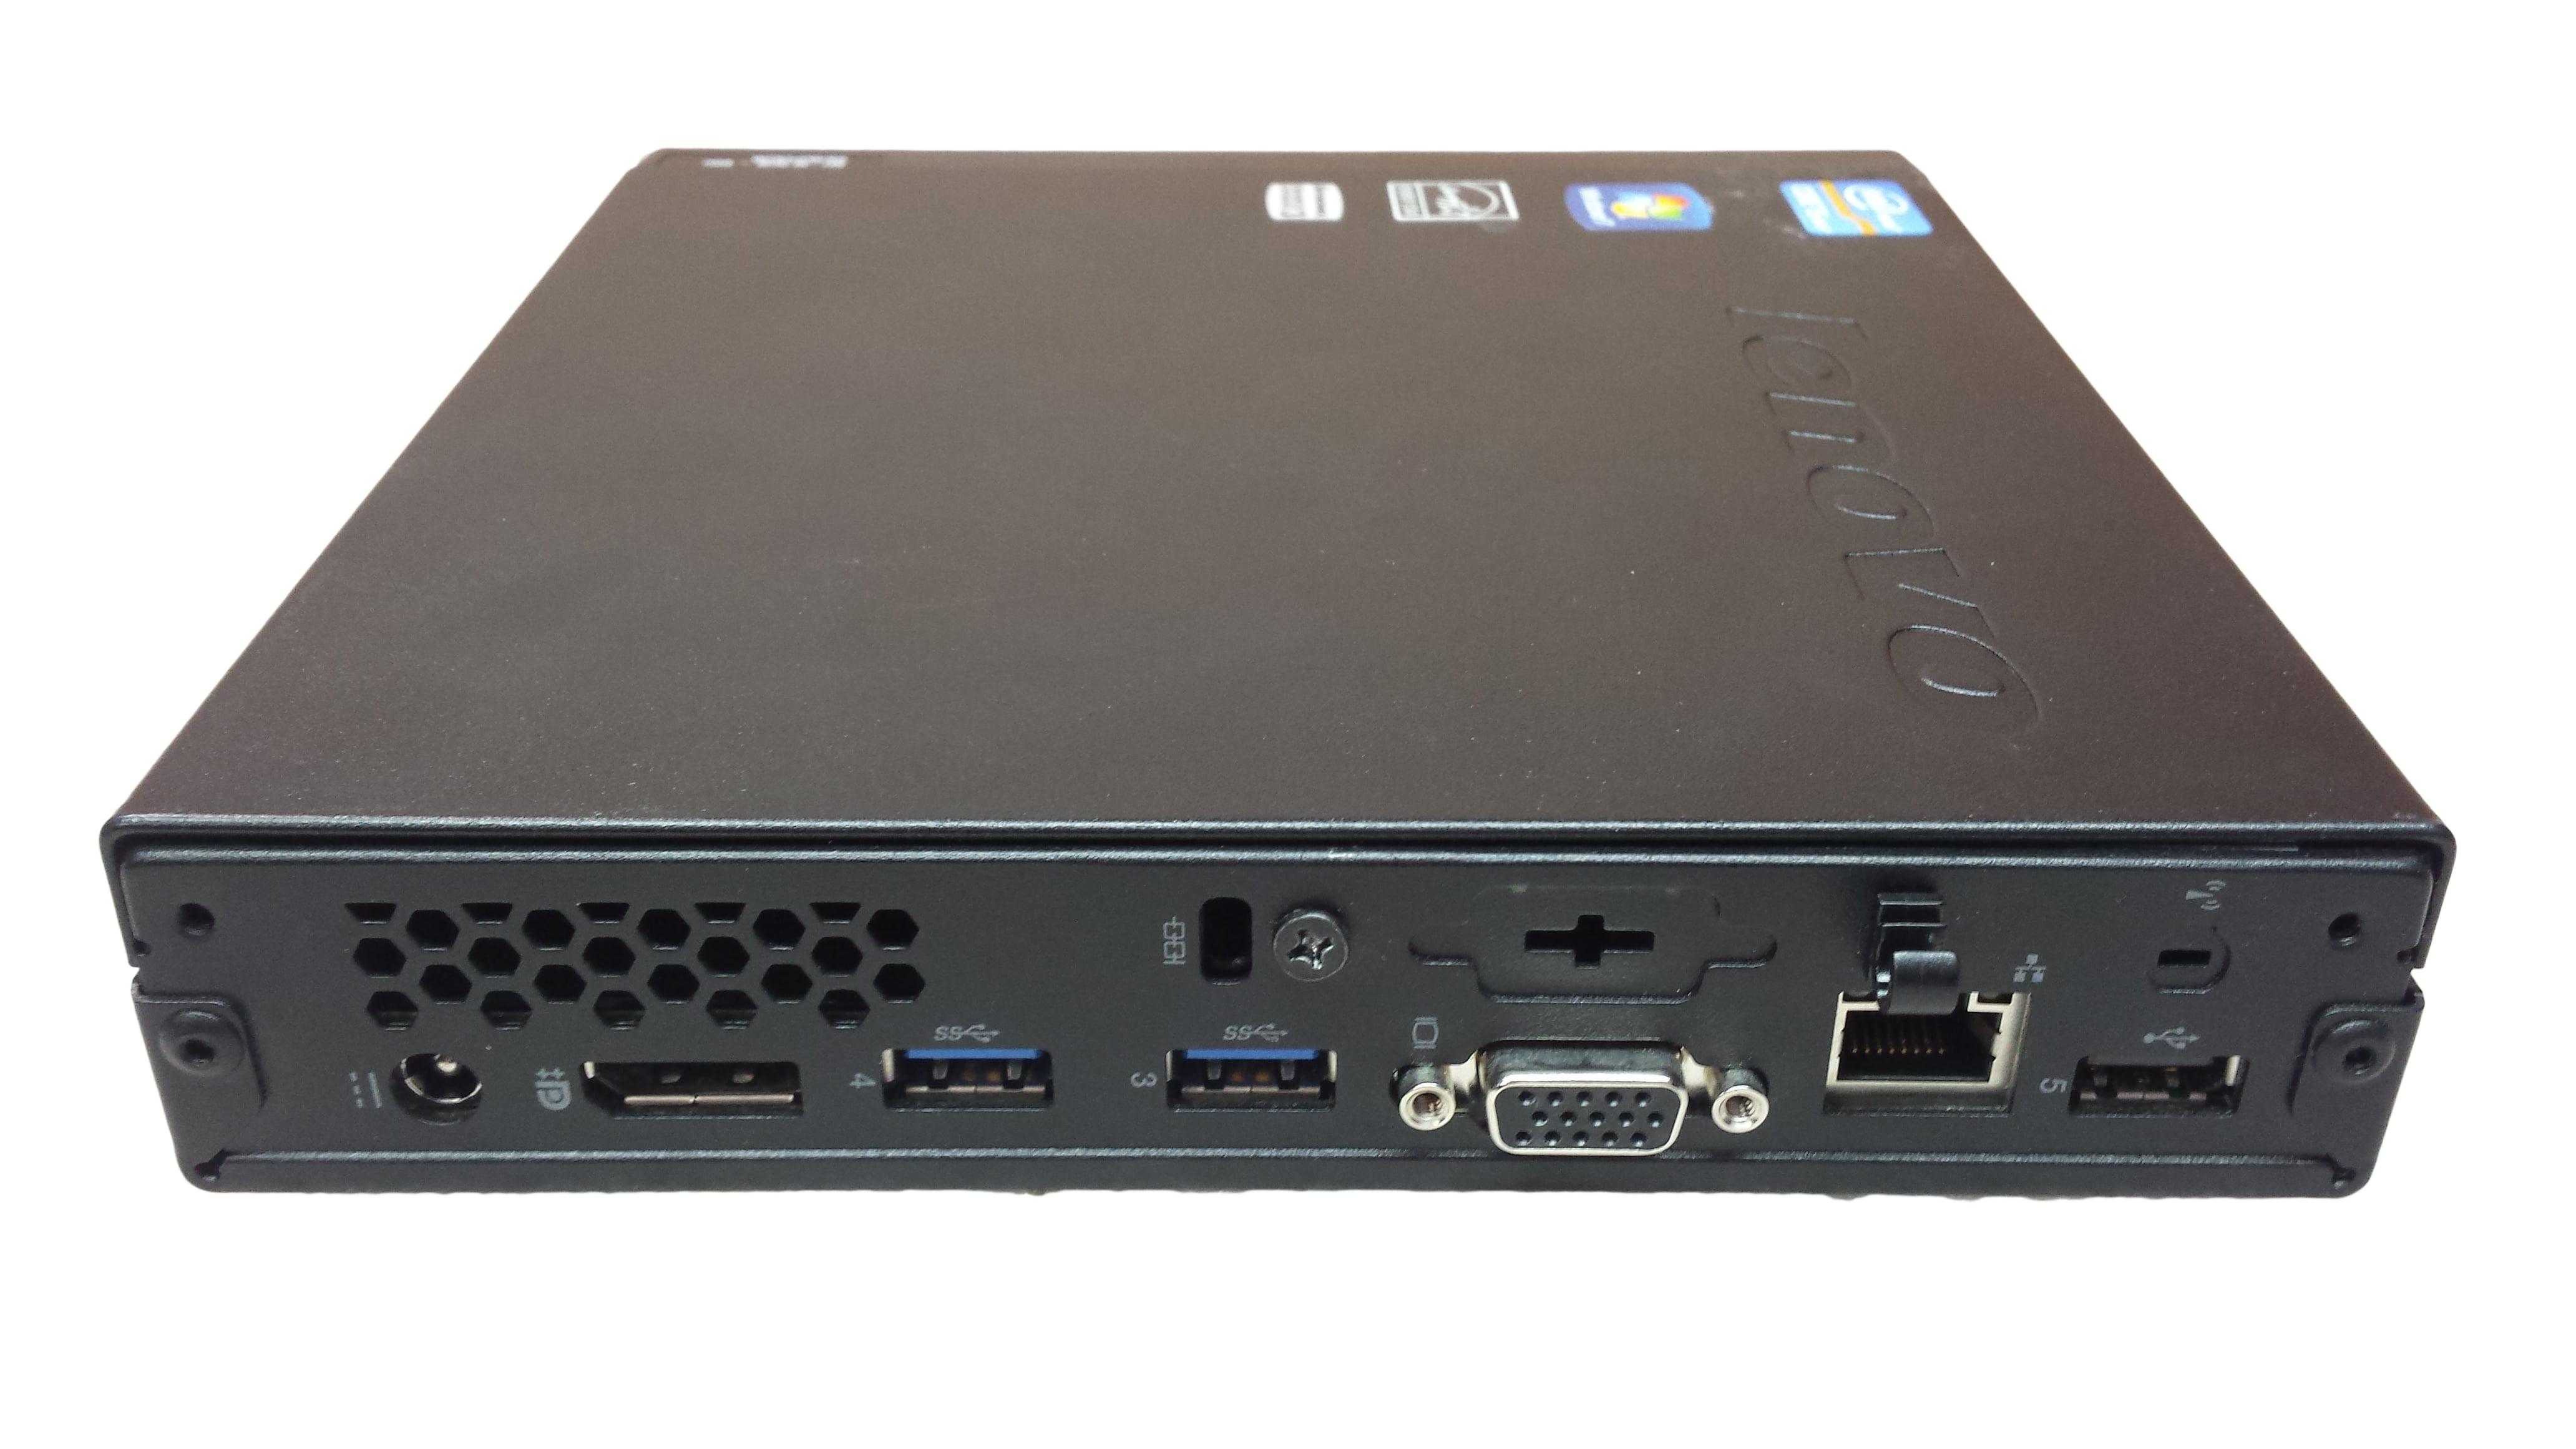 Lenovo 3238 B5U ThinkCentre M92p Intel Core i5-3470T 2 9GHz Desktop AIO